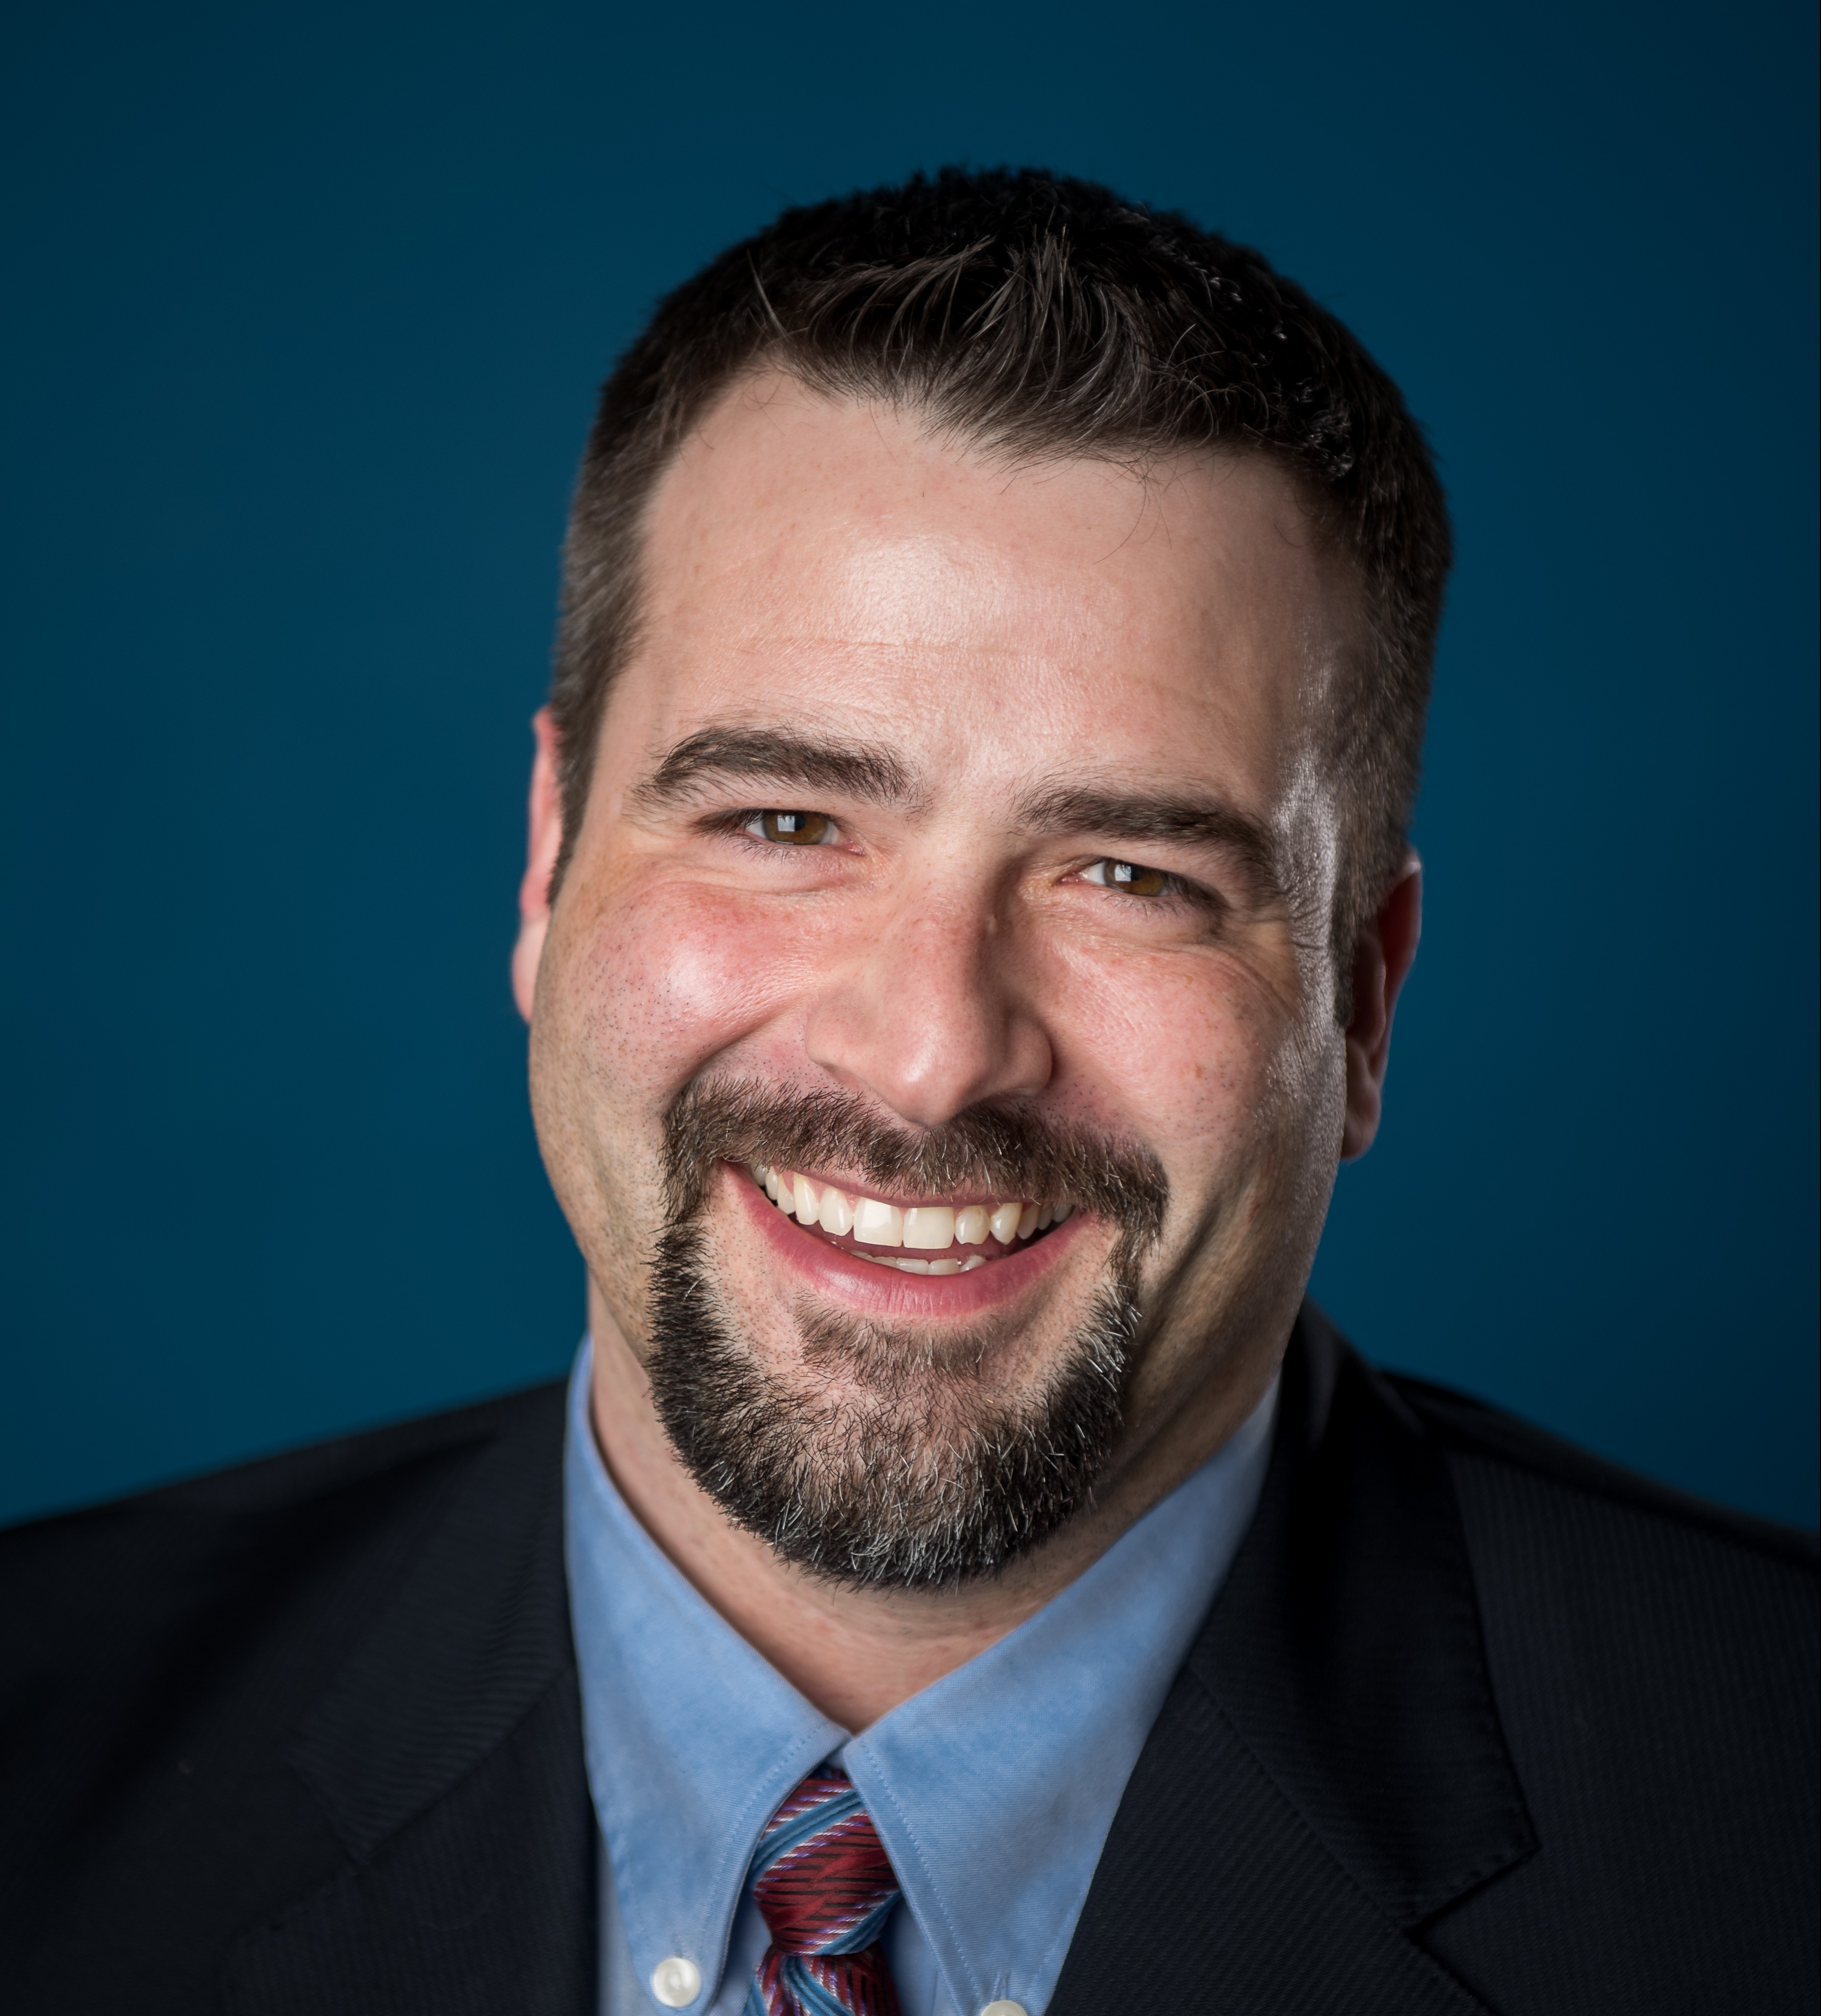 Ryan Michalowski